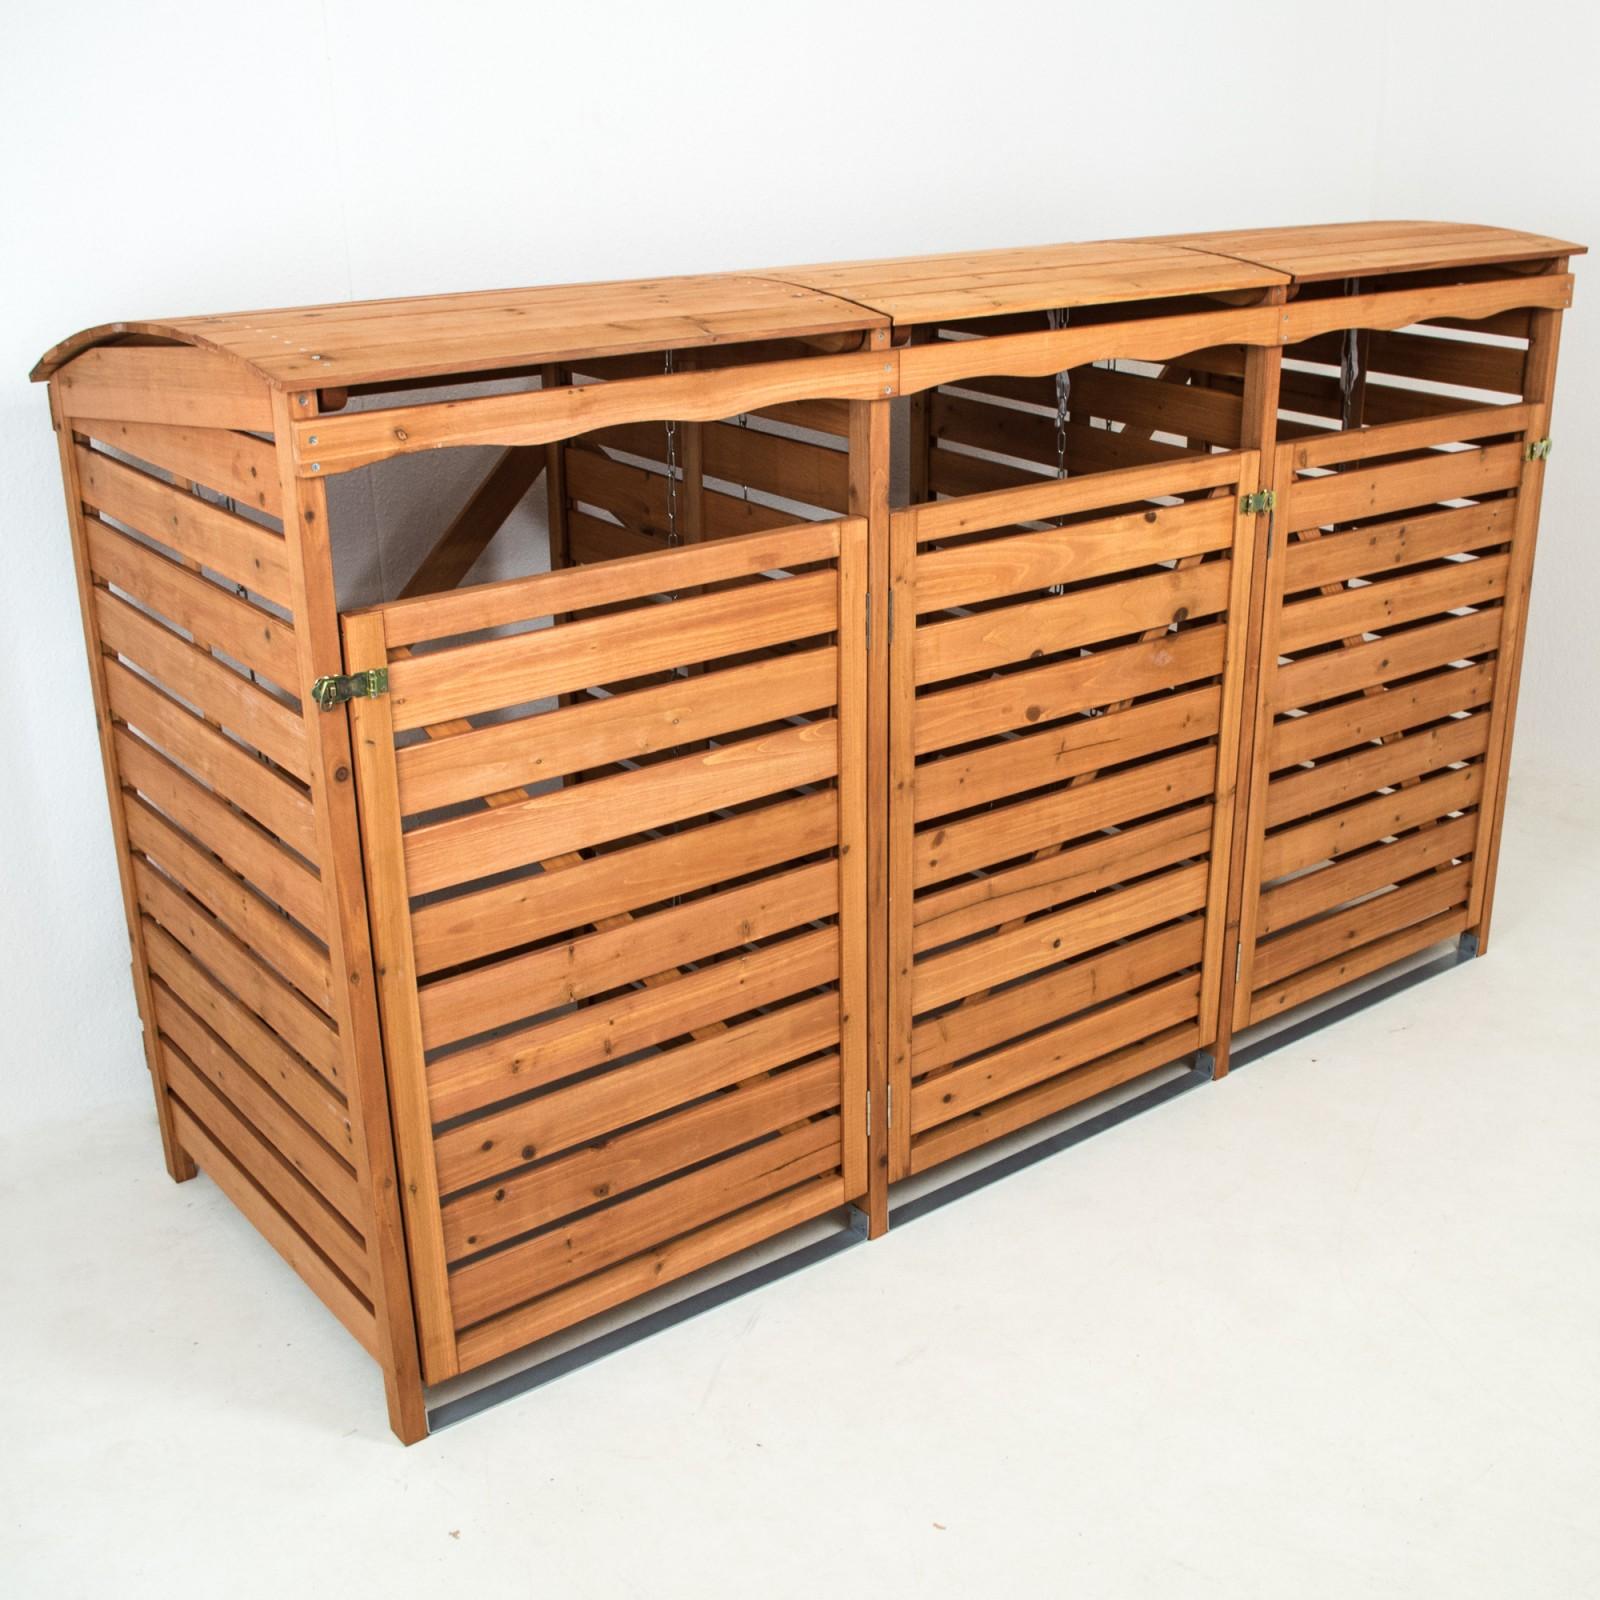 mülltonnenbox holz mülltonnenverkleidung 3mülltonnen 240l